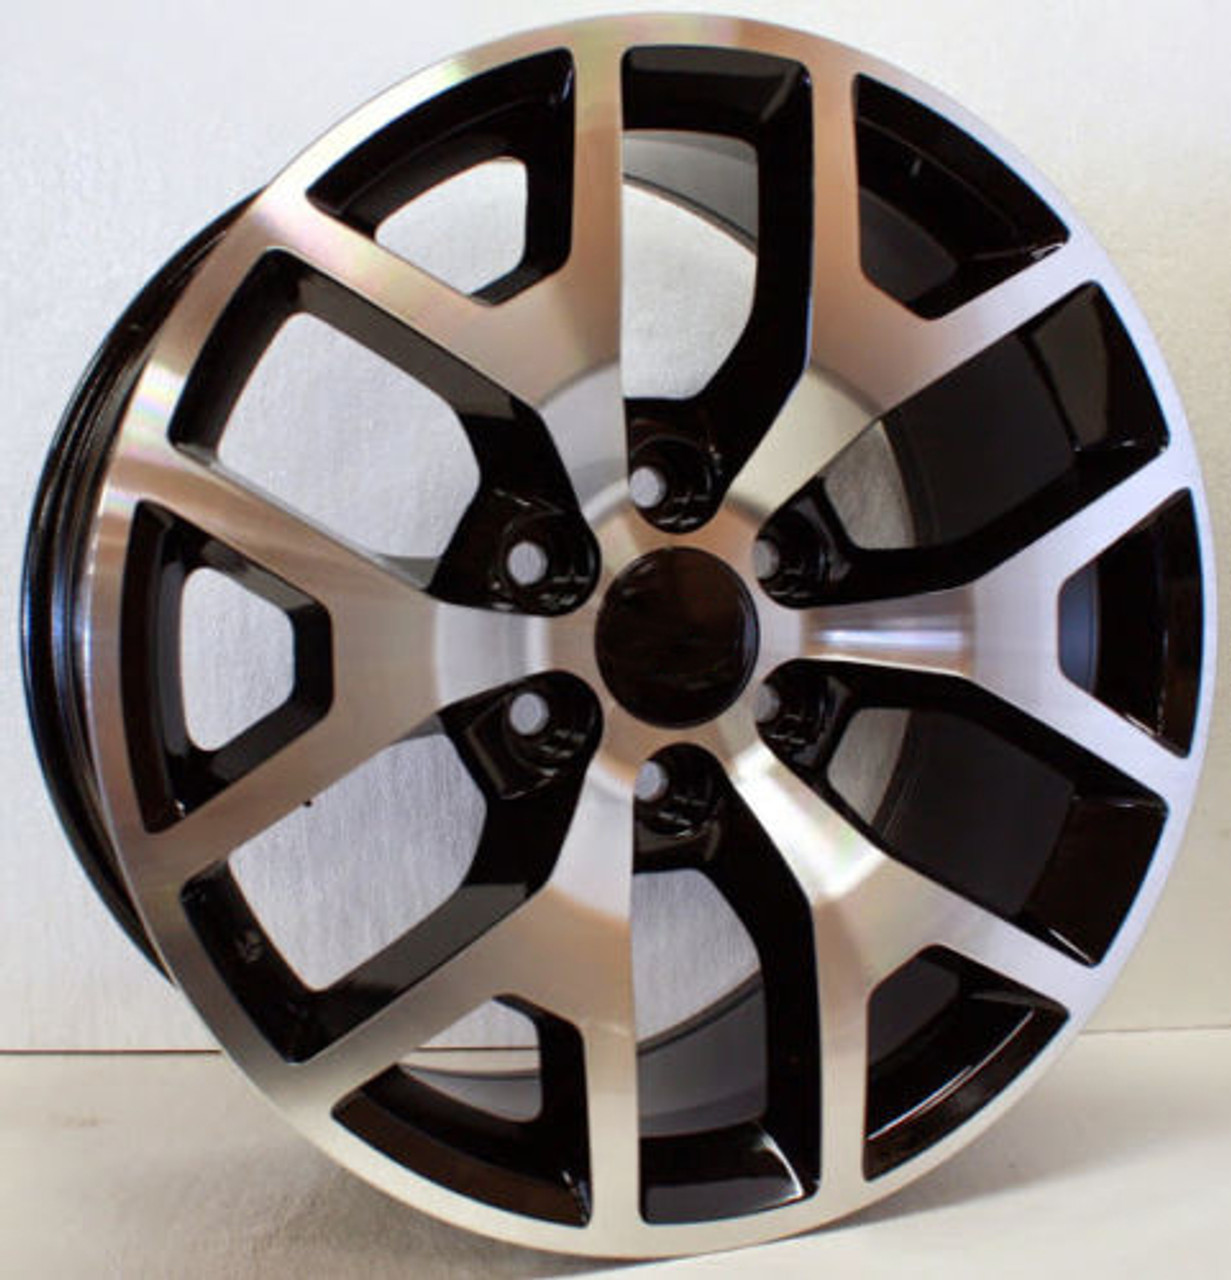 "Black and Machine 20"" Honeycomb Wheels for Chevy Silverado, Tahoe, Suburban - New Set of 4"